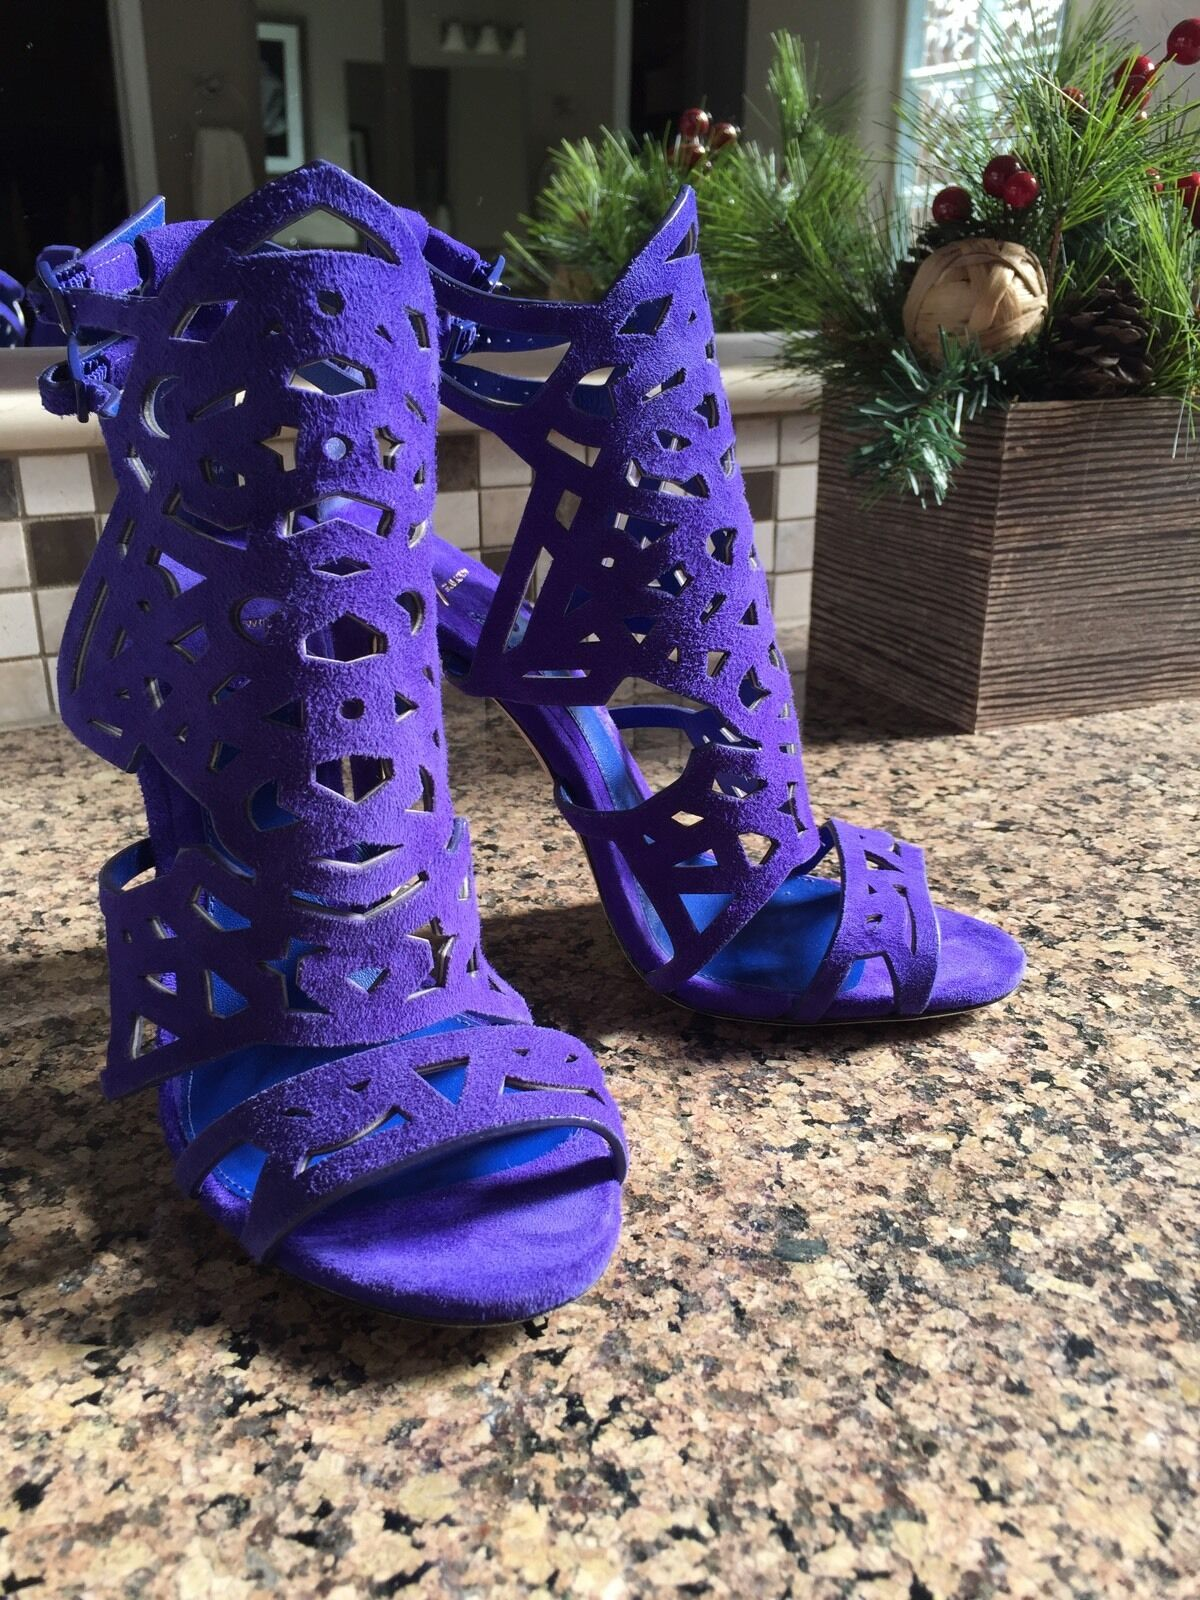 varie dimensioni B BRIAN ATWOOD viola Suede donna Designer Designer Designer Strappy Sandals 6 Heels avvioies blu  qualità ufficiale